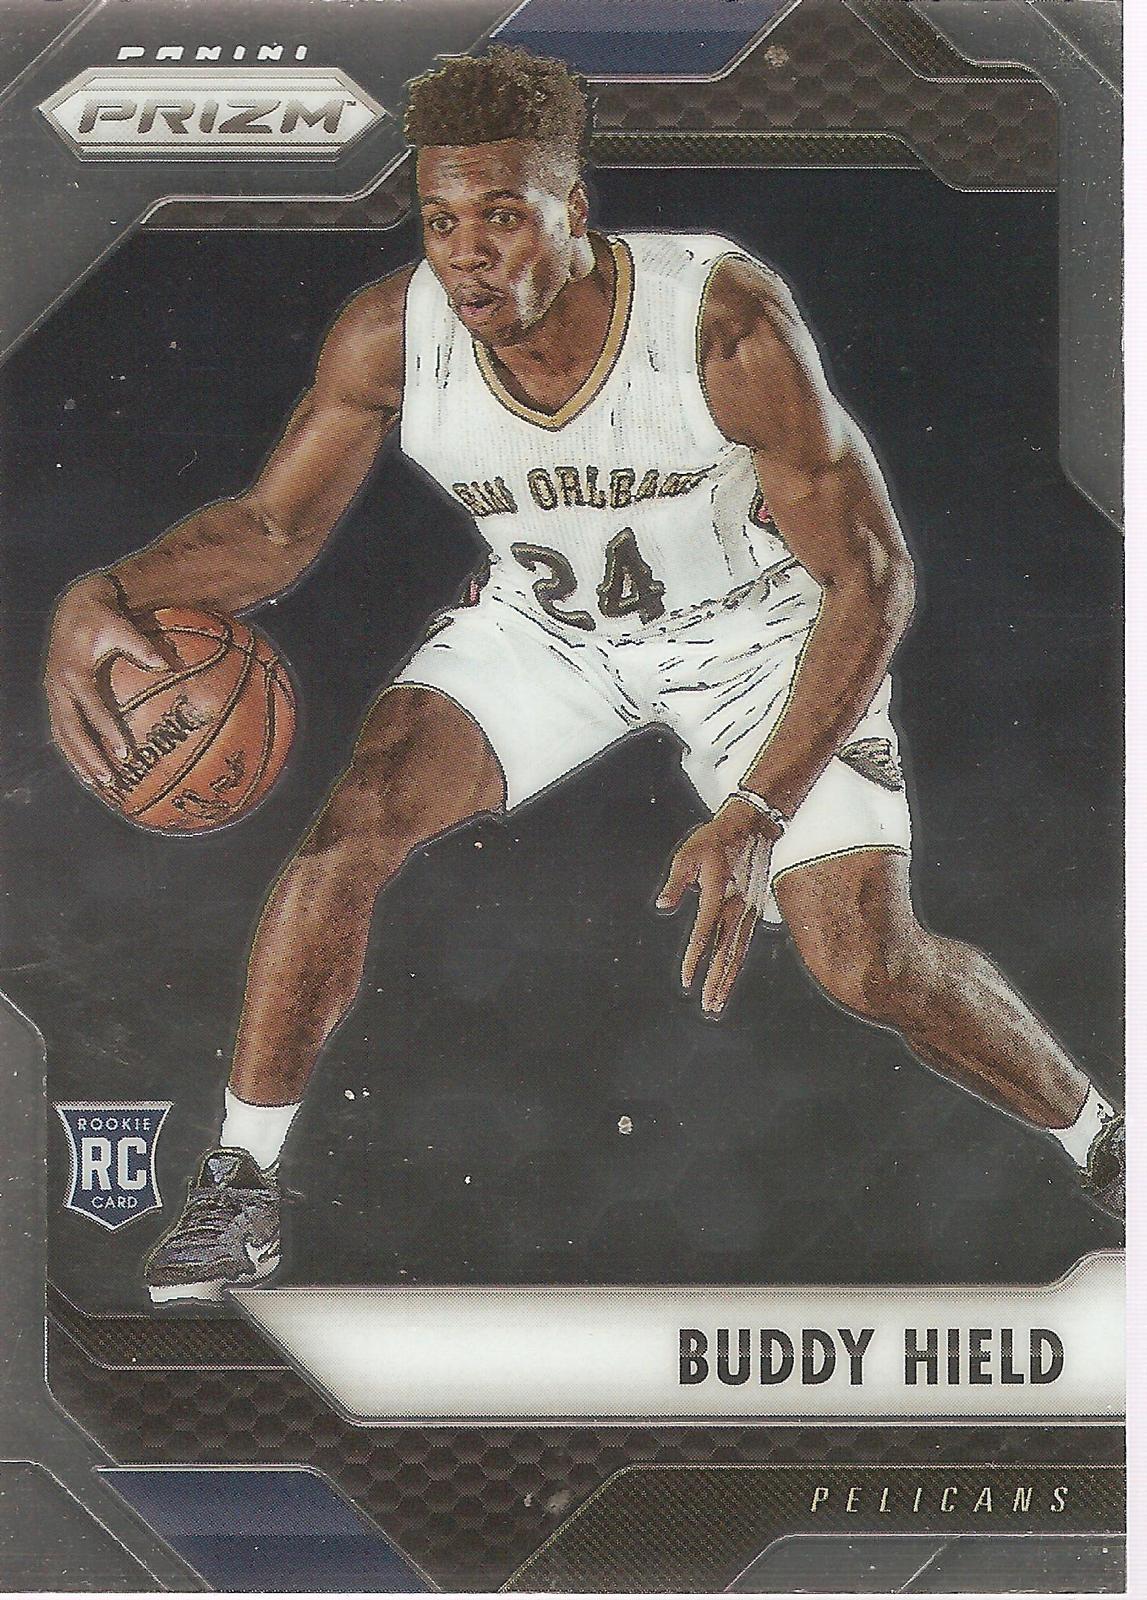 Buddy Hield Prizm 16-17 #192 Rookie Card New Orleans Hornets Sacramento Kings